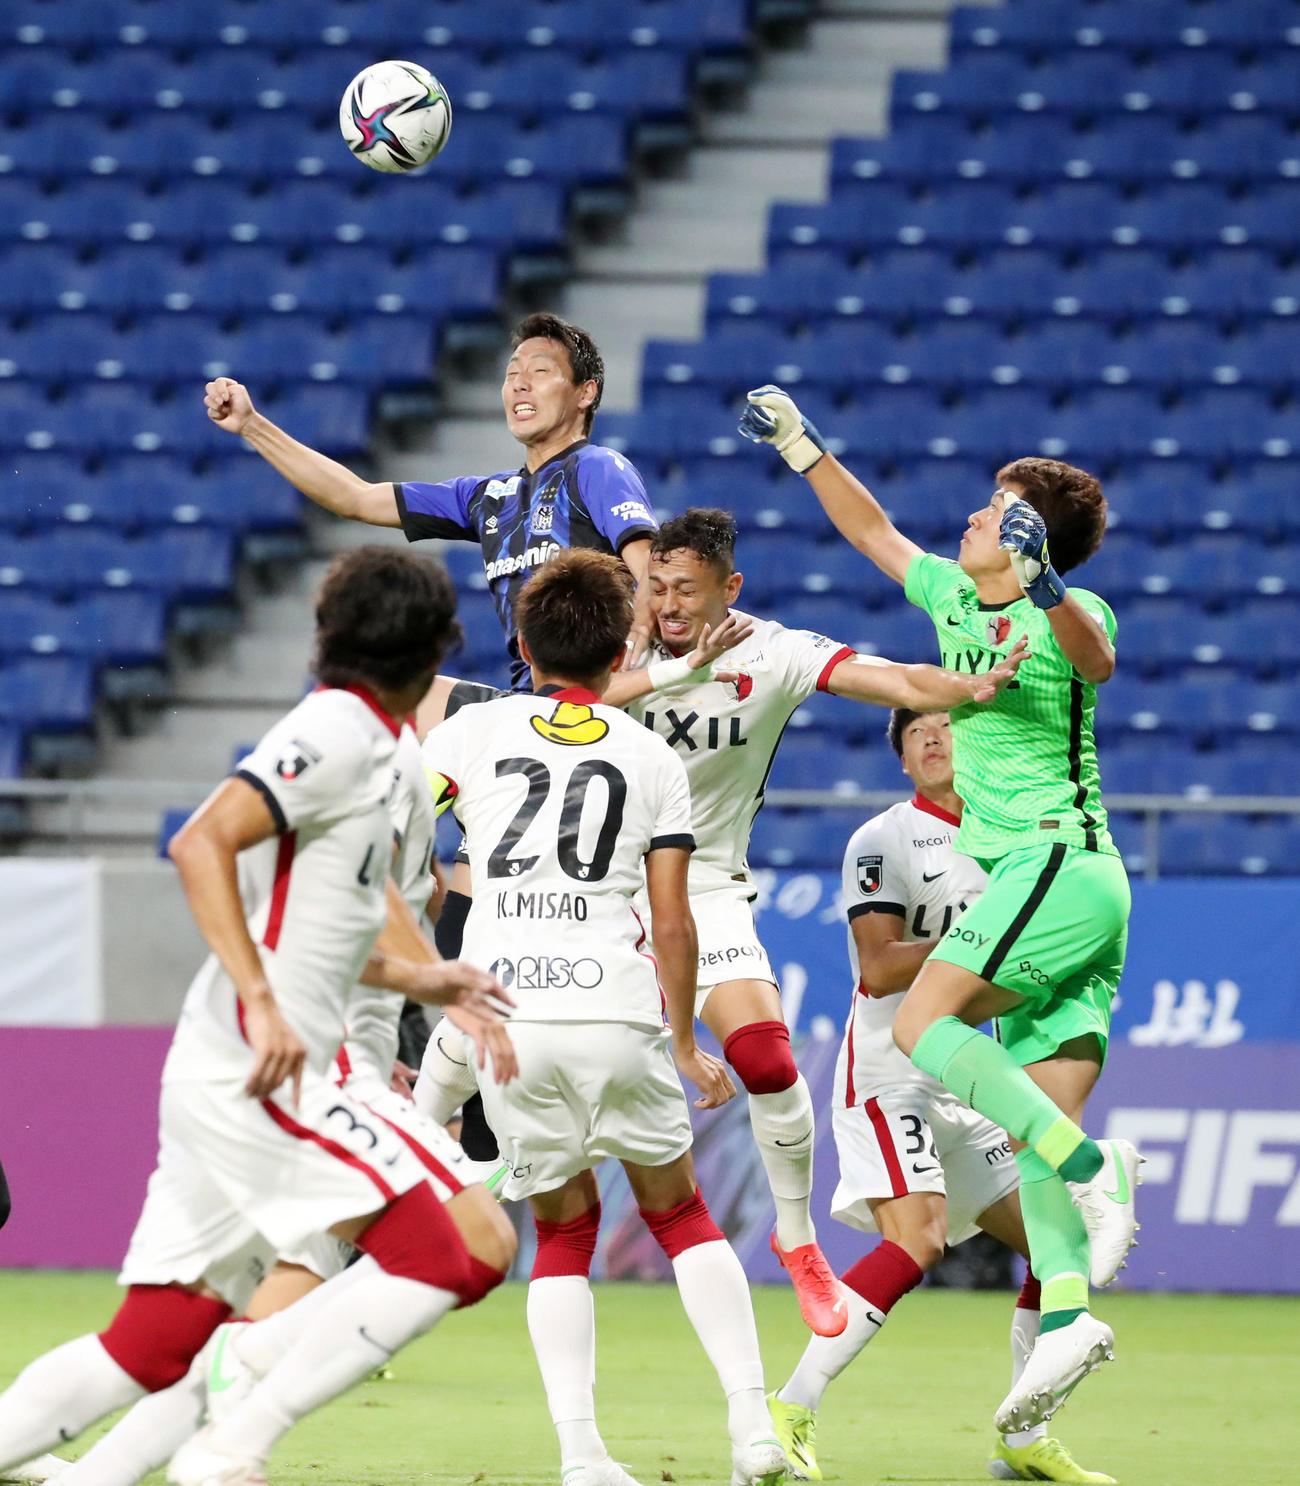 G大阪対鹿島 前半、G大阪昌子は頭でボールを押し込もうとするがGKにセーブされゴールできず(撮影・加藤哉)